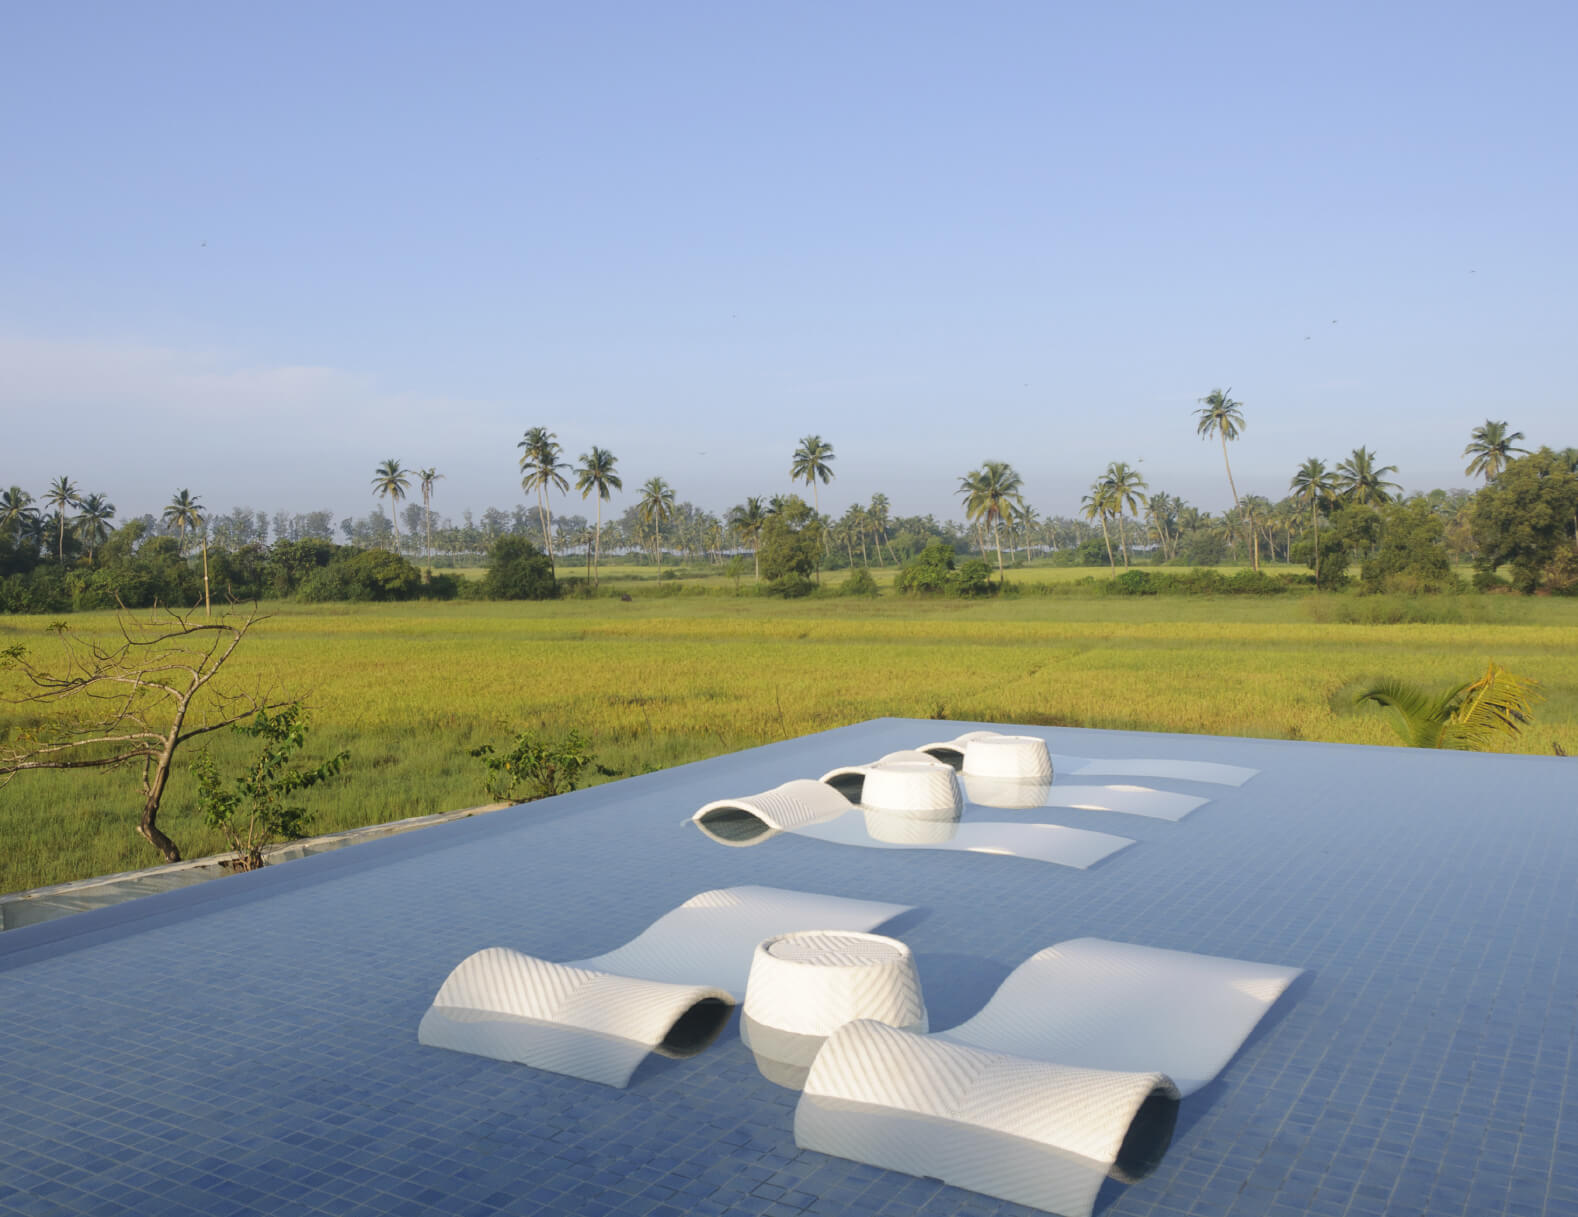 47 Incredible Infinity Pool Designs Stunning s